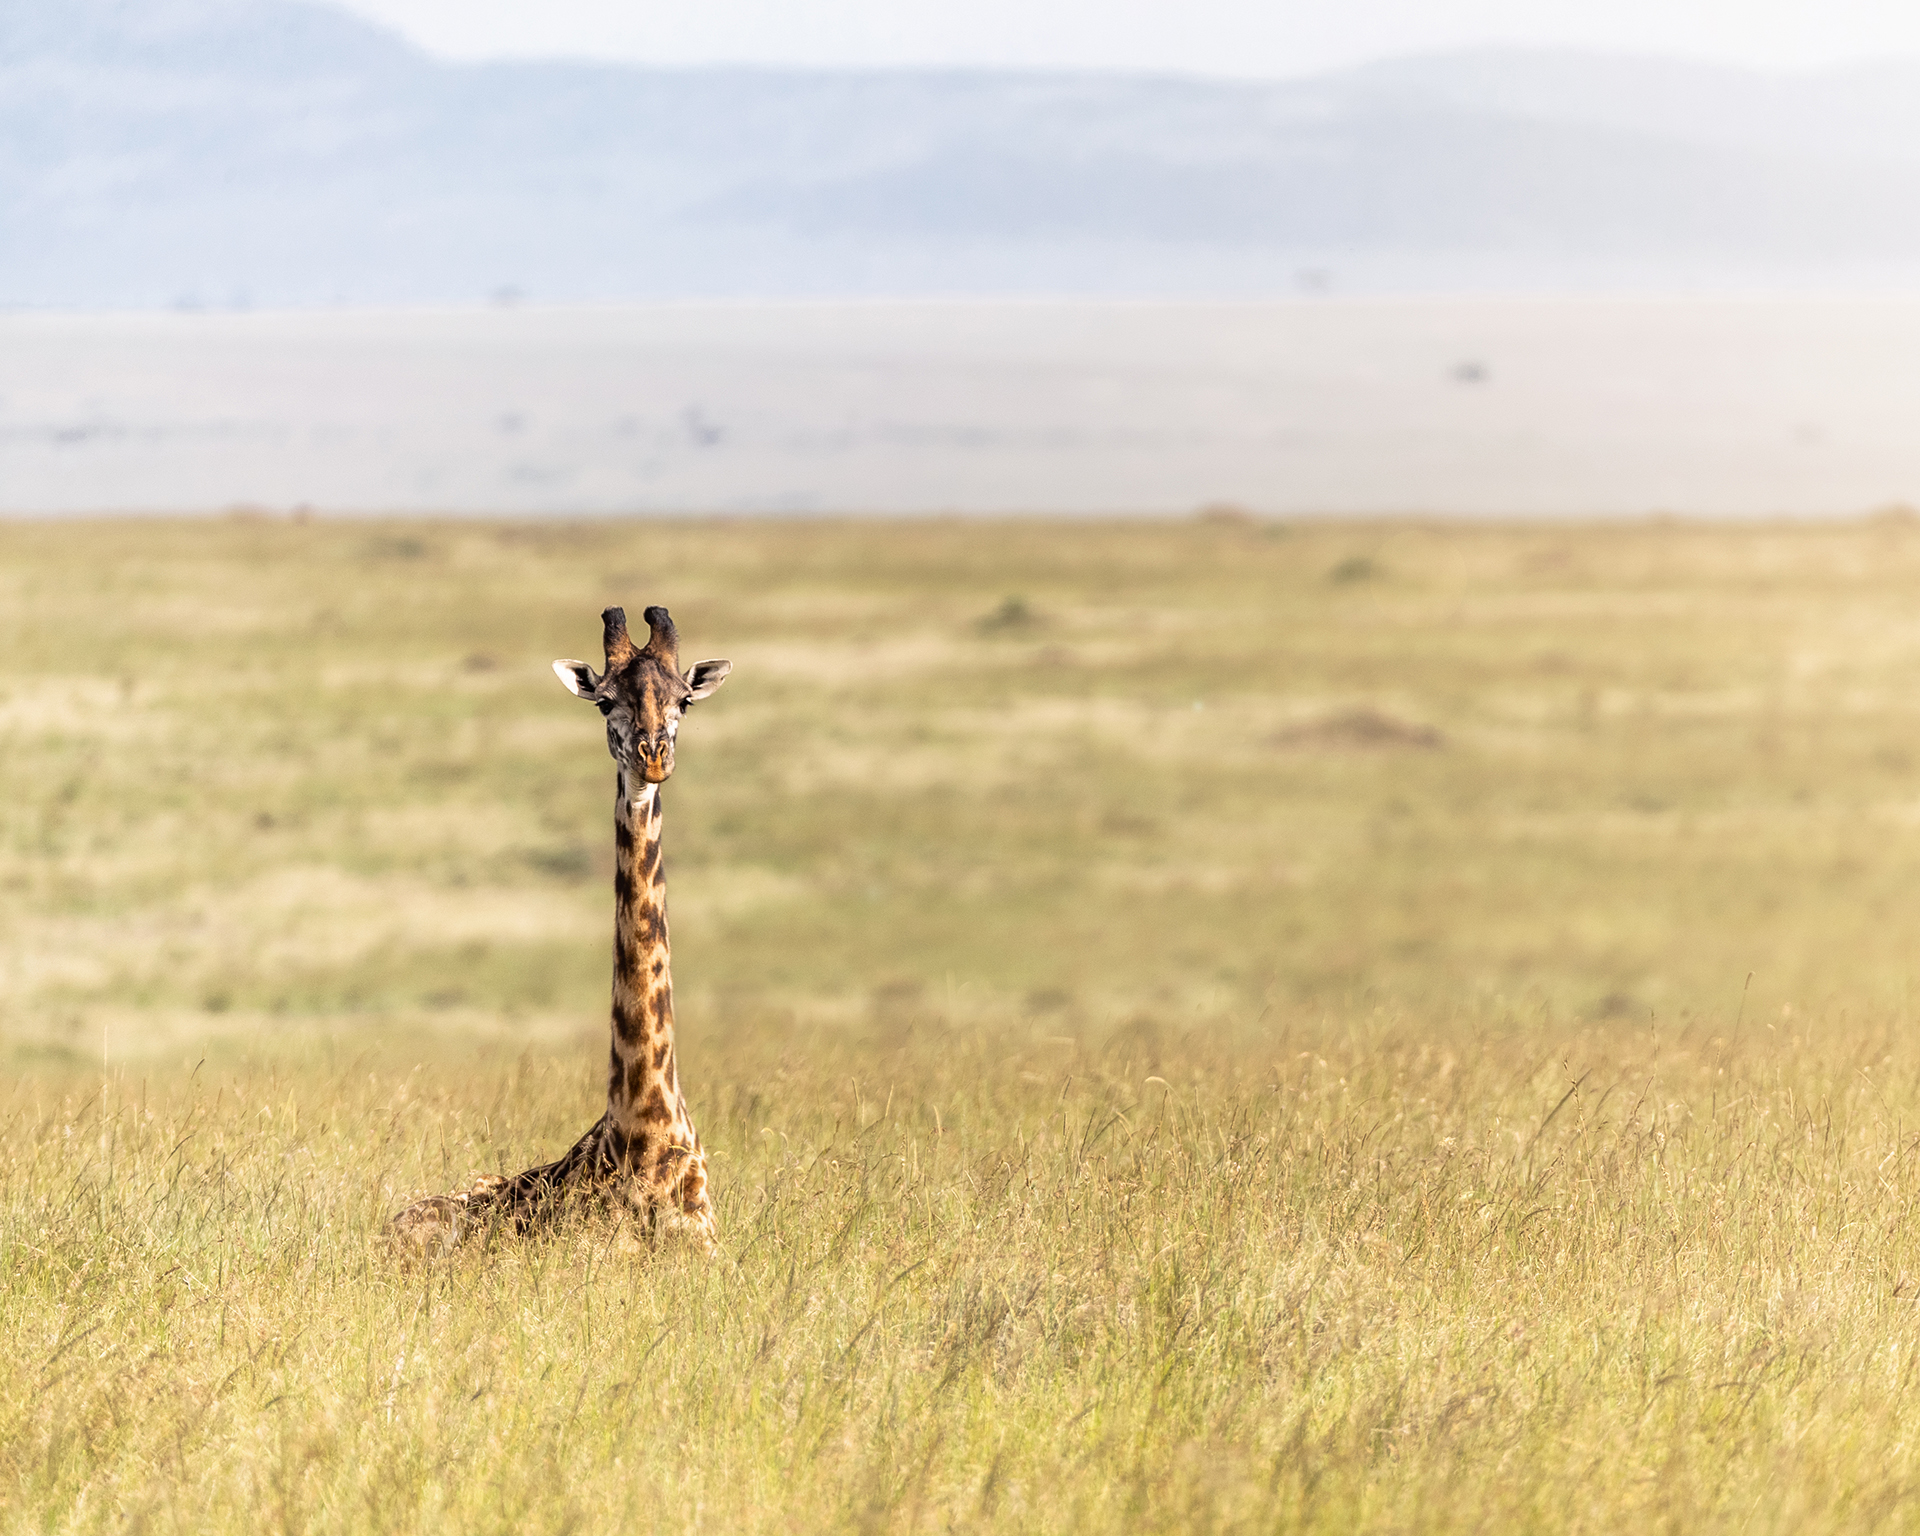 Single Masai Giraffe Lying in Africa Grasslands.jpg